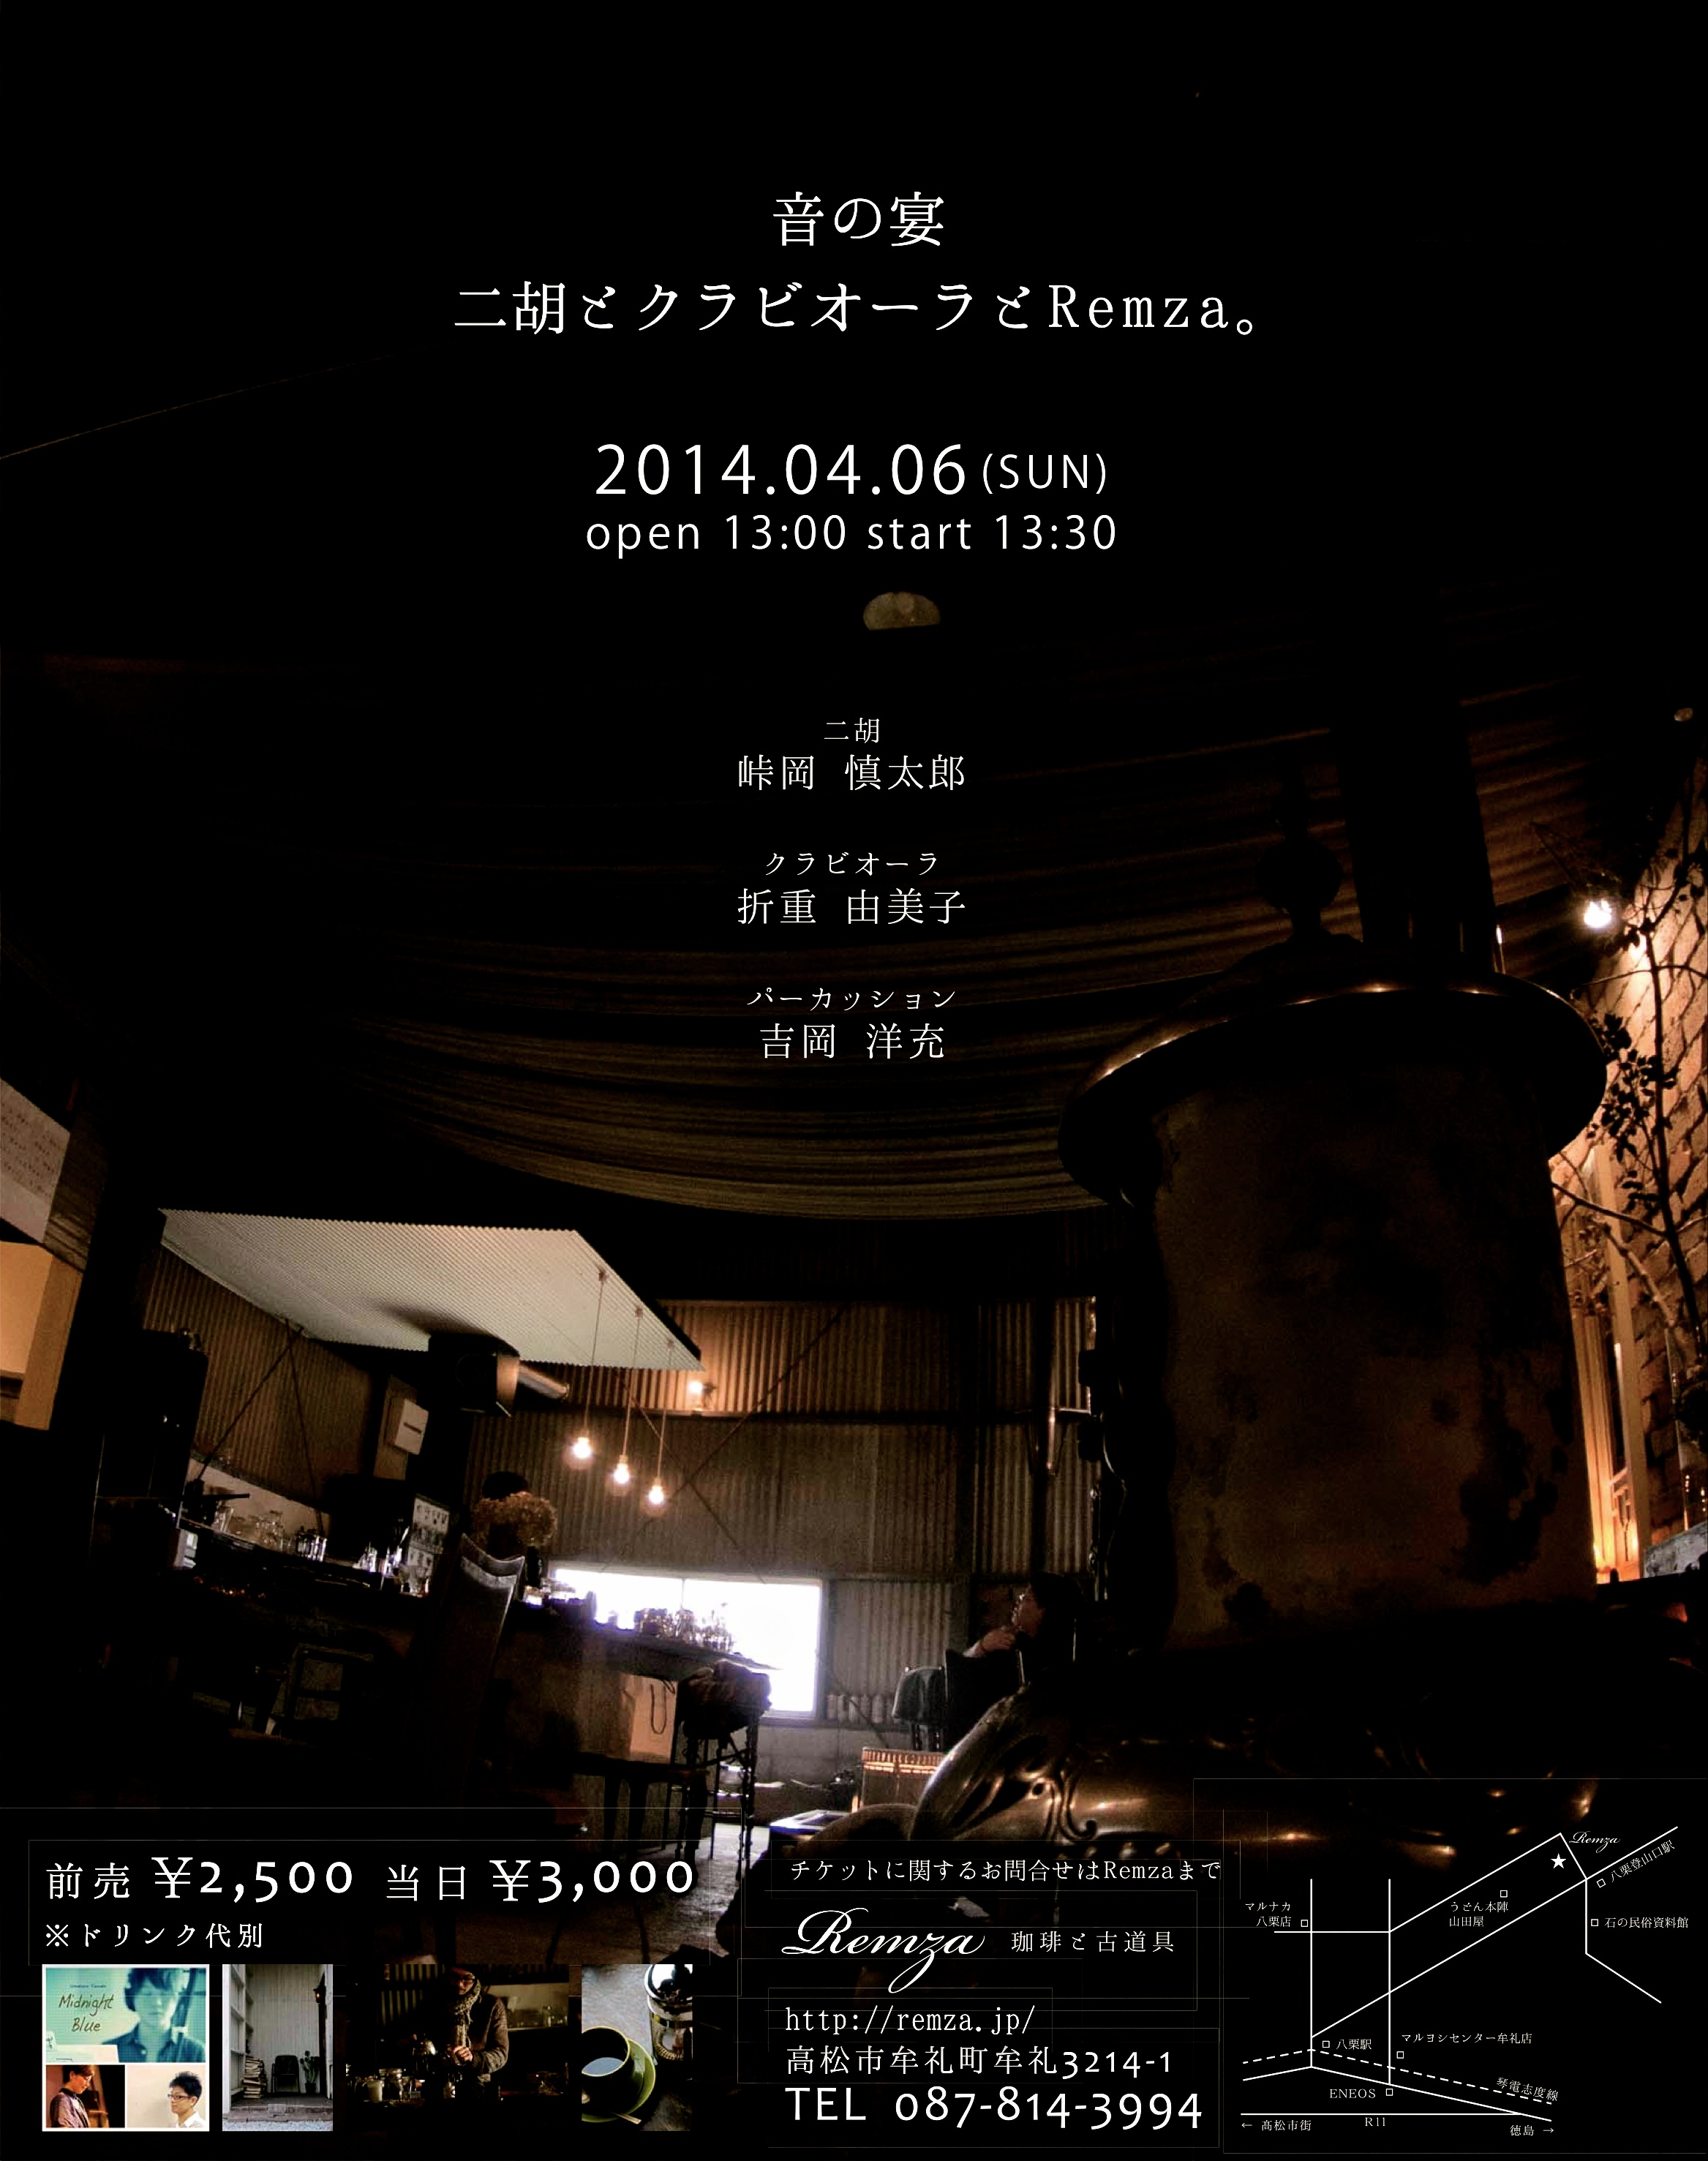 Remza レムザ / 珈琲 / 古道具 / 高松市 / イベント / 古家具 / 二胡 / クラビオーラ / パーカッション / 音楽 / ライブ / LIVE